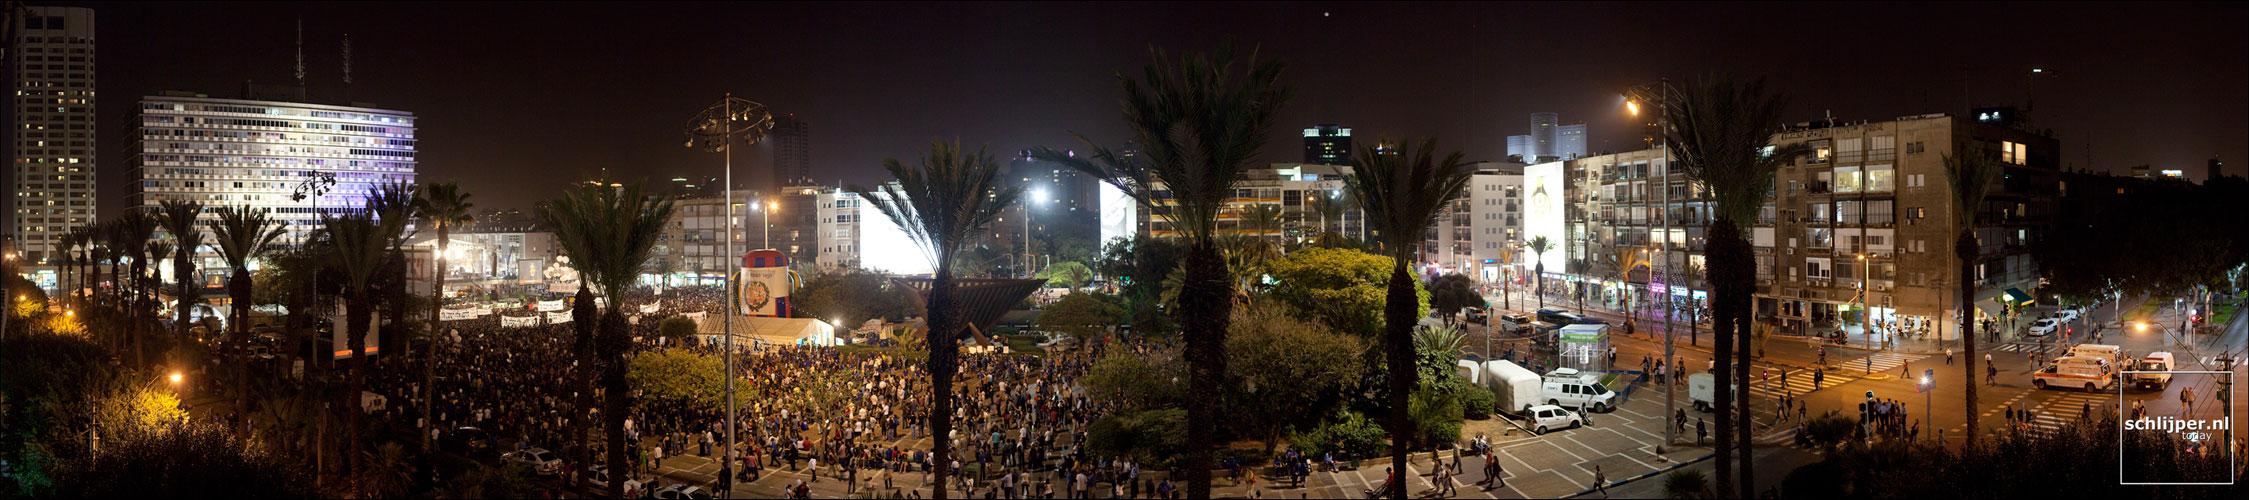 Israel, Tel Aviv, 7 november 2009